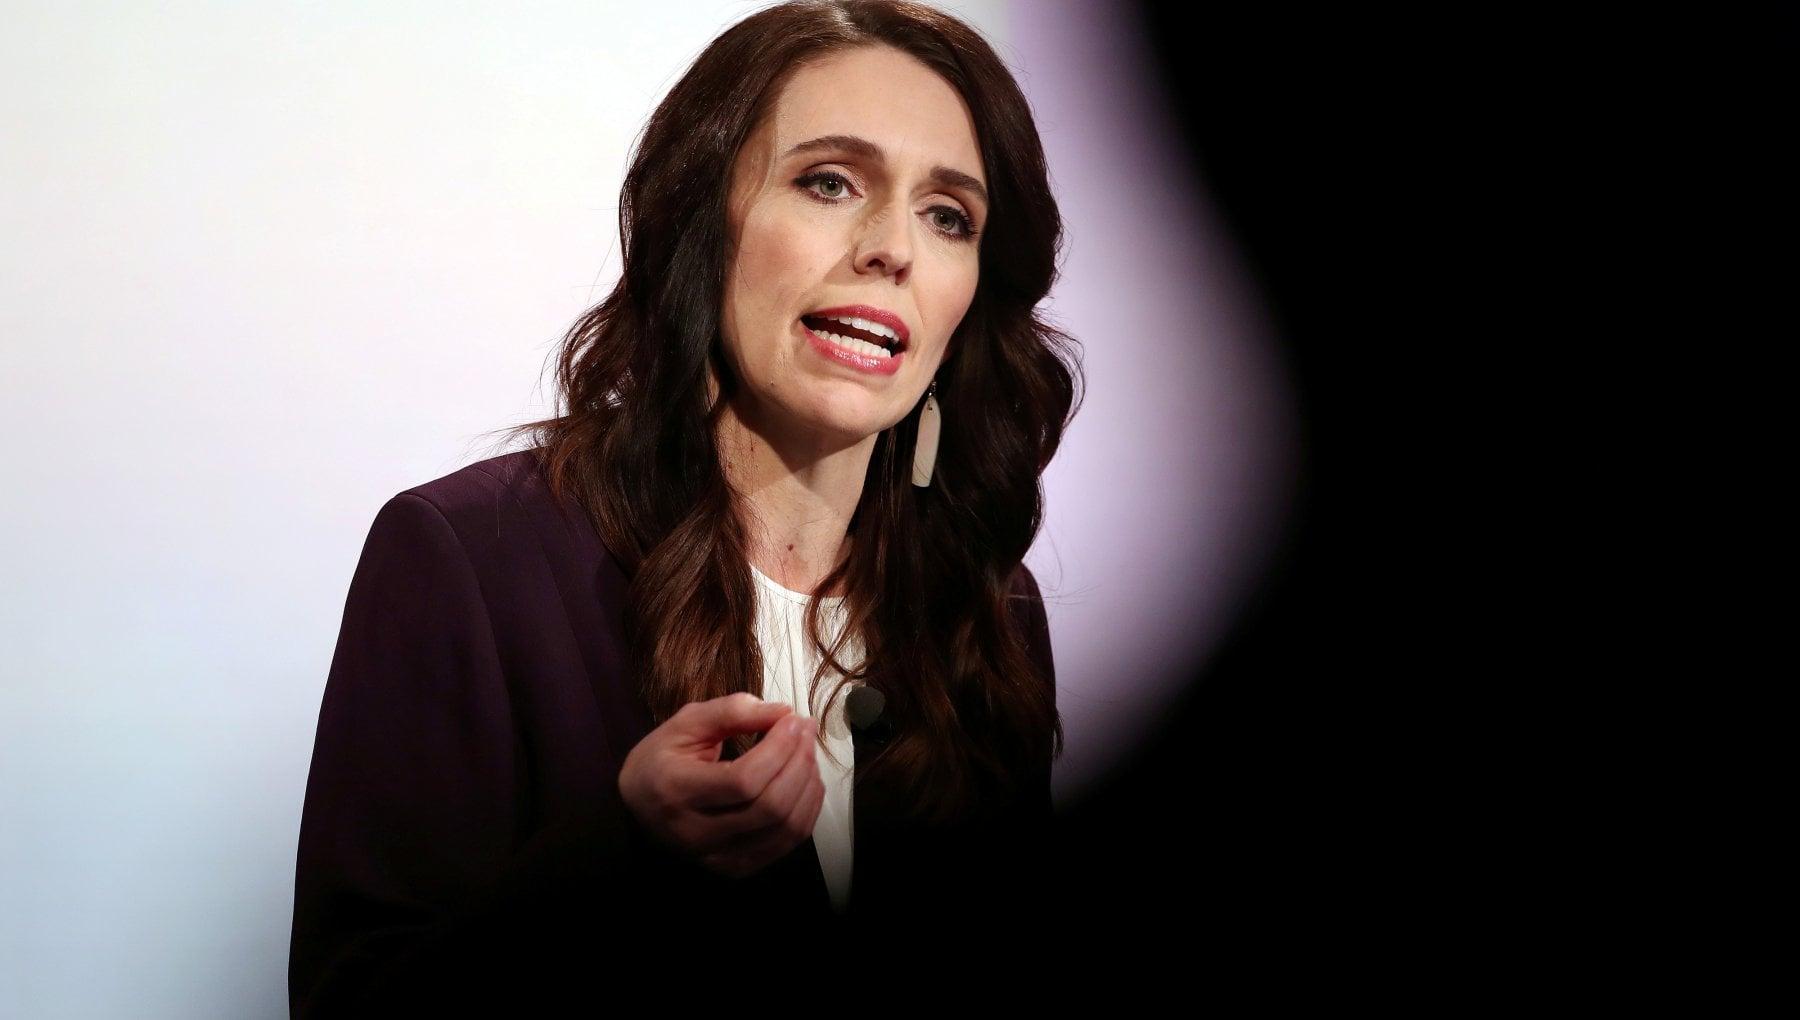 213628207 bd54c2c8 482e 467a a47a 38f1a27e1950 - Nuova Zelanda, tre giorni di congedo parentale nei casi di aborto spontaneo